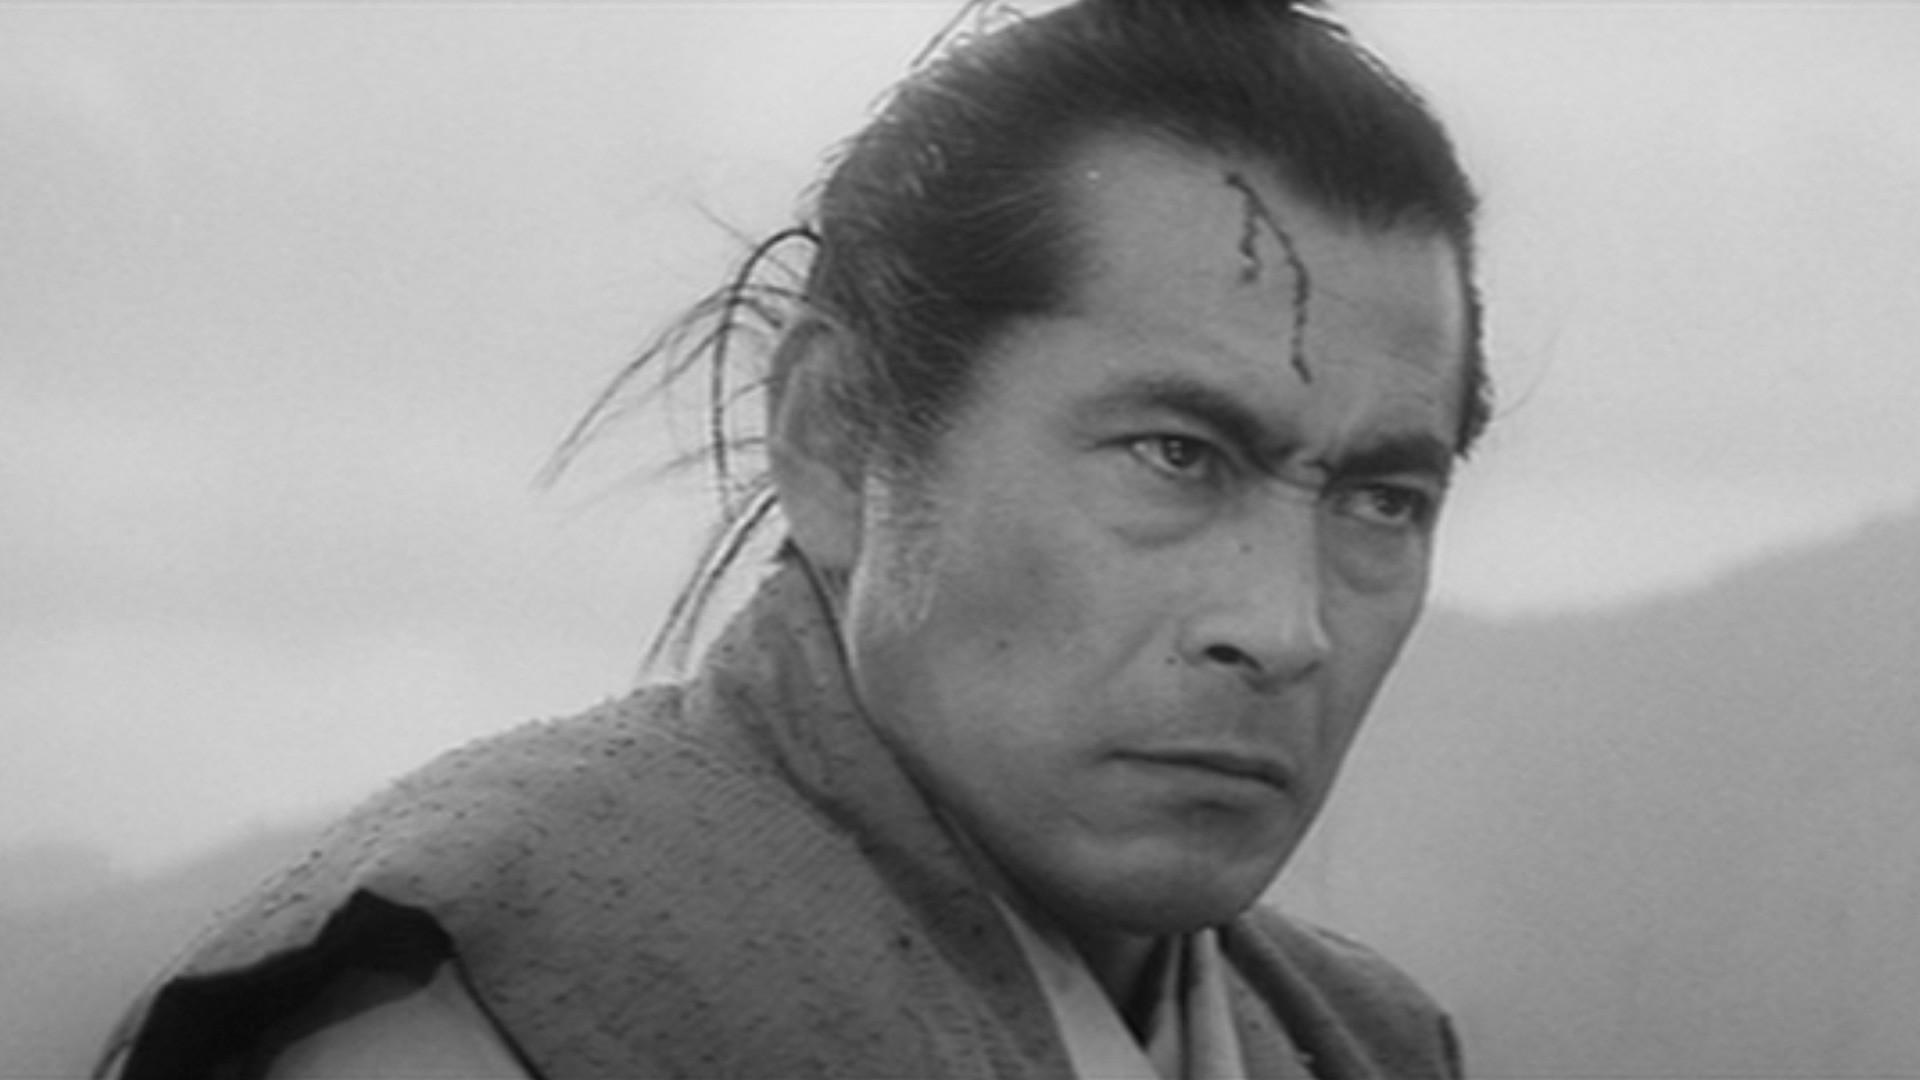 attore toshiro mifune rifiuta ruolo di darth vader e obi-wan kenobi in star wars